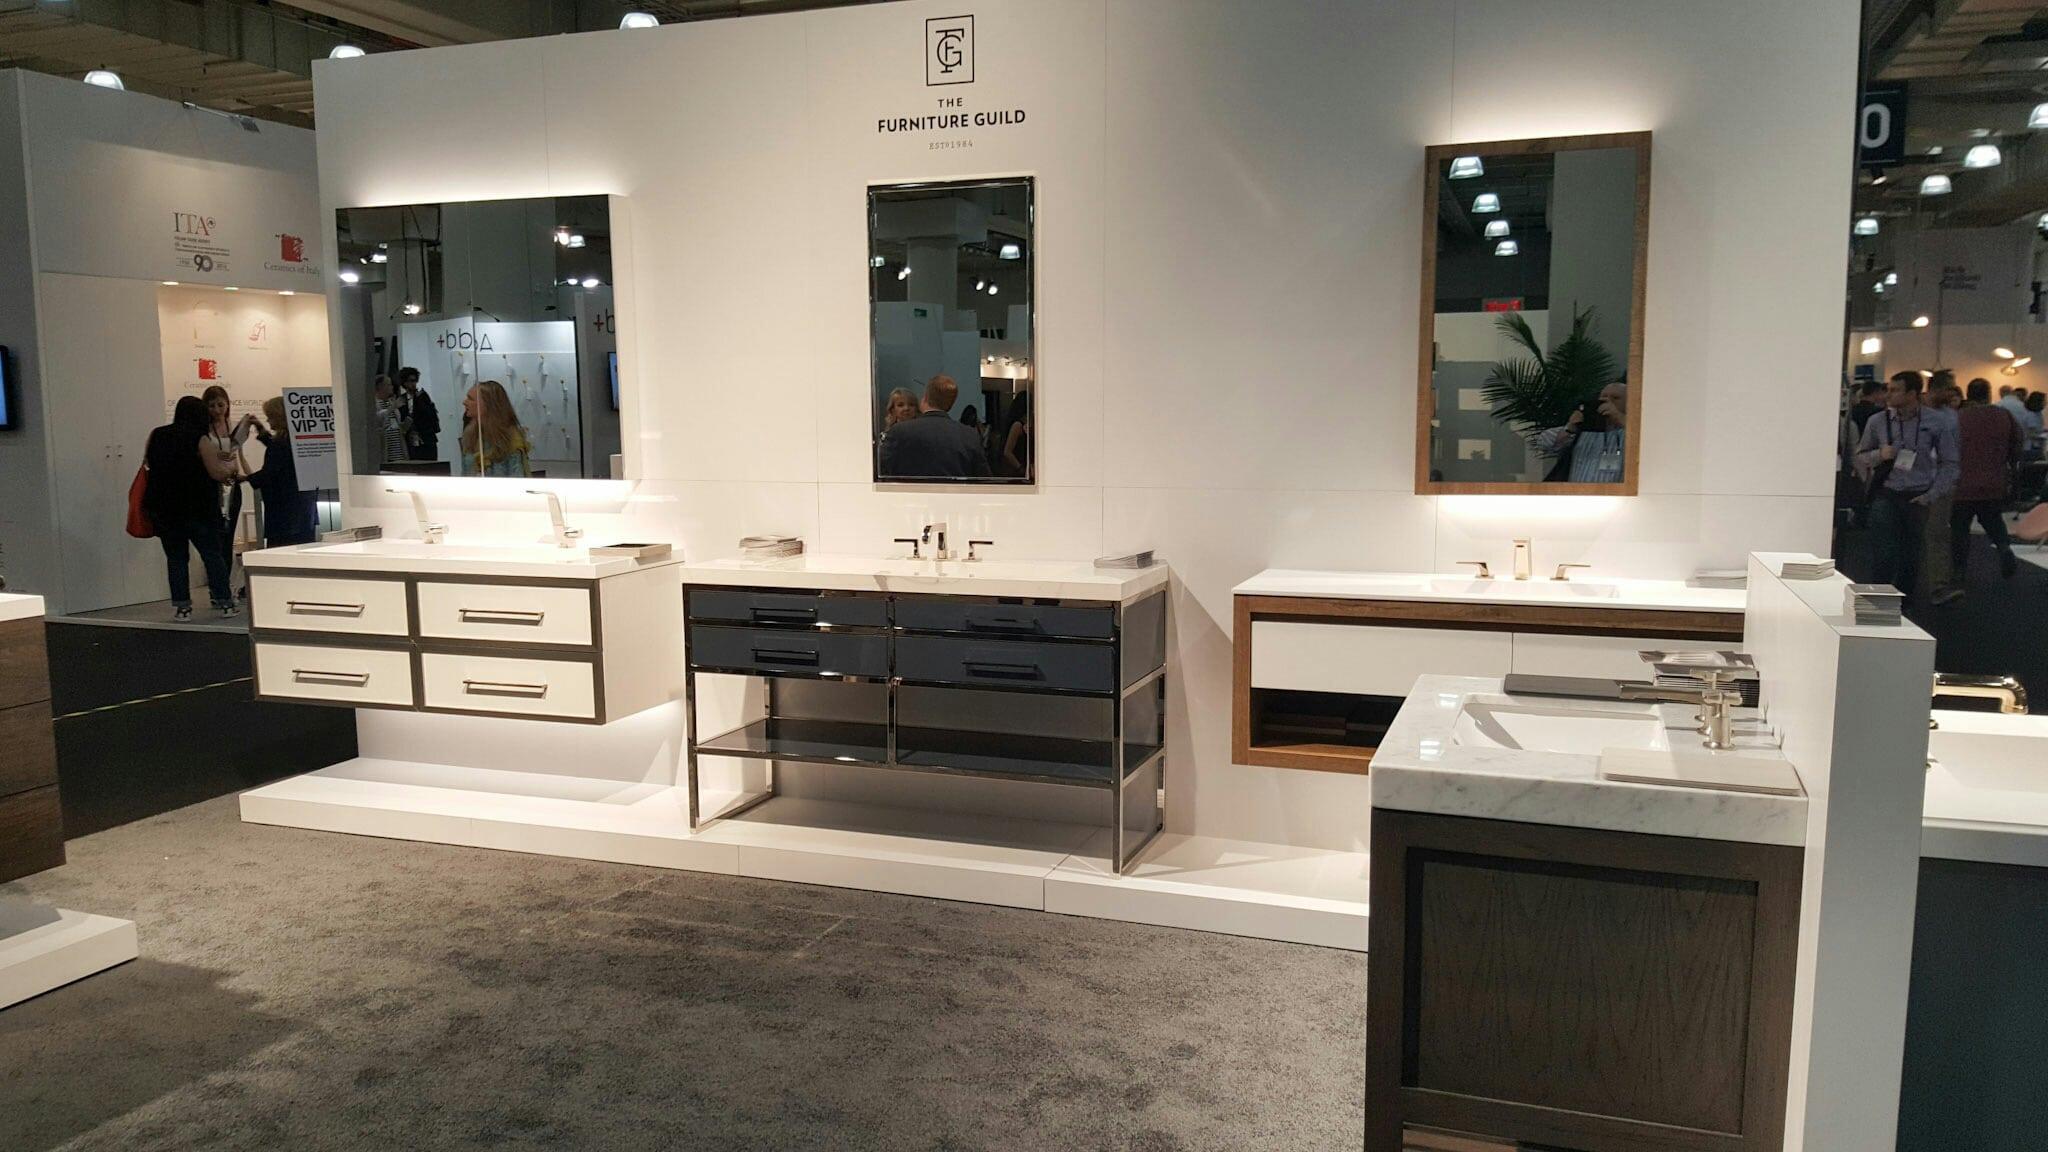 ICFF Furniture Guild stand